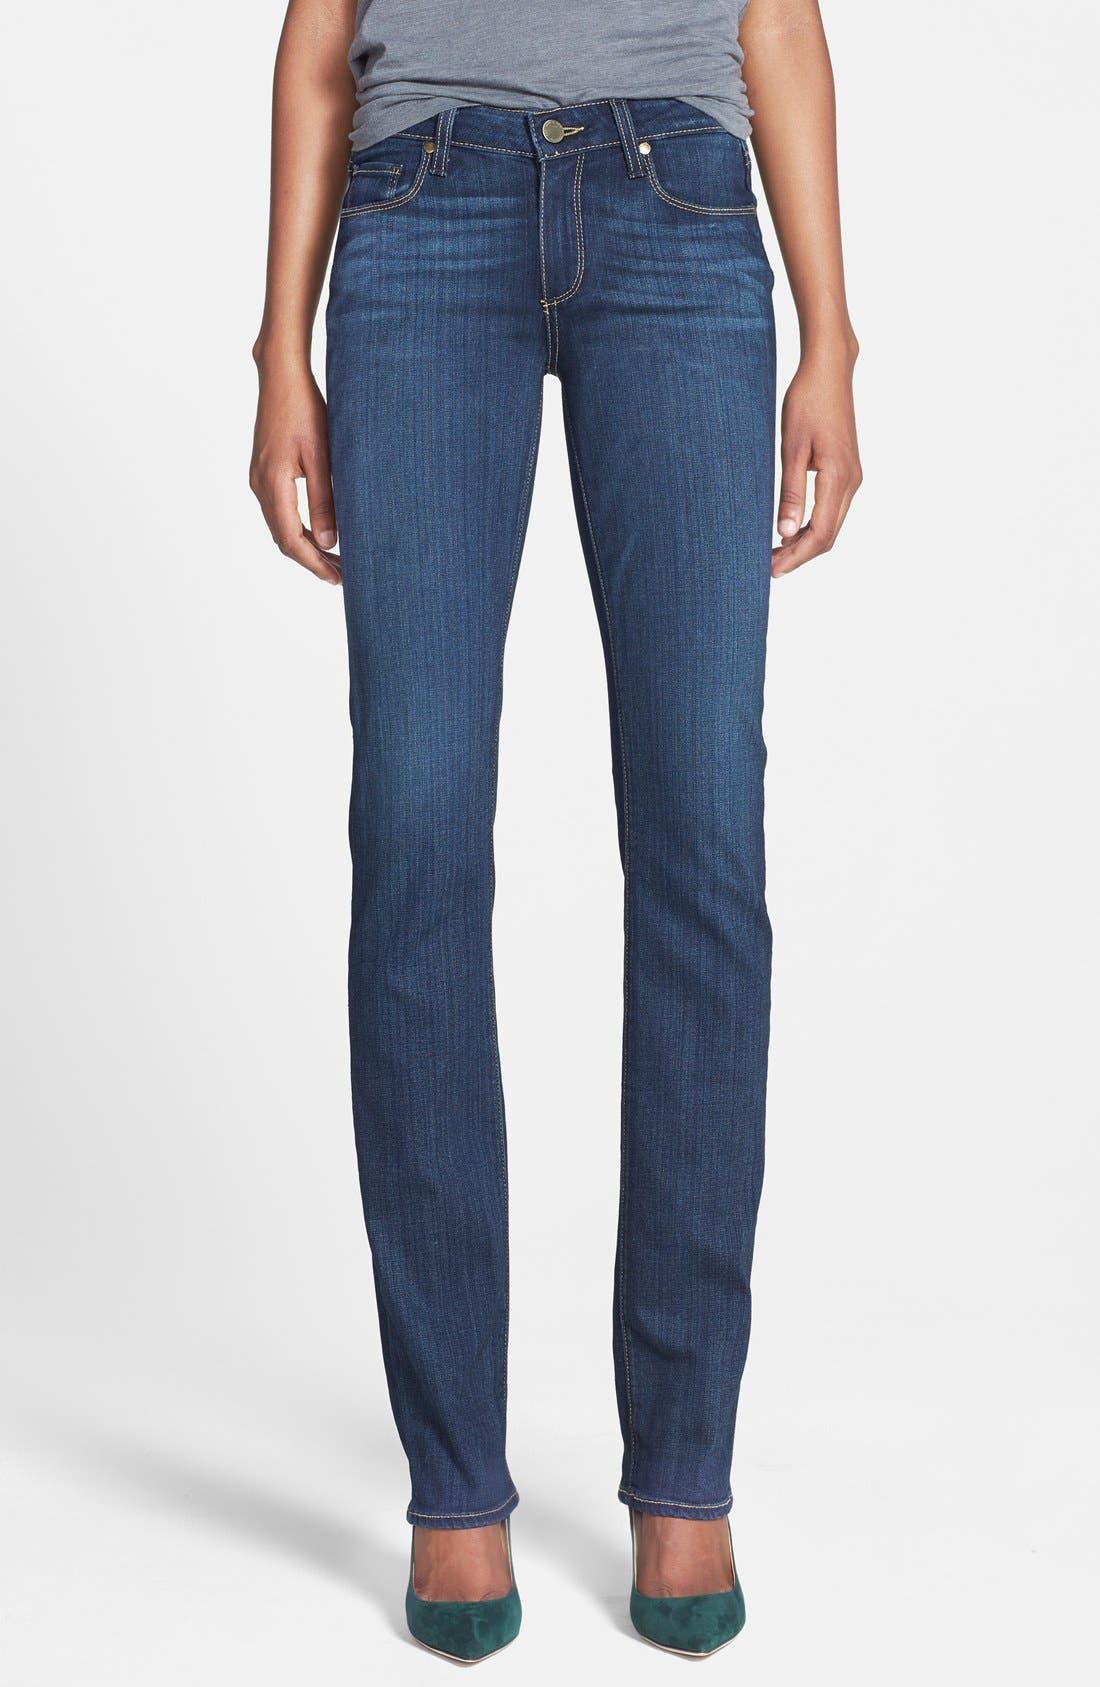 PAIGE Transcend - Skyline Straight Leg Jeans (Vista)